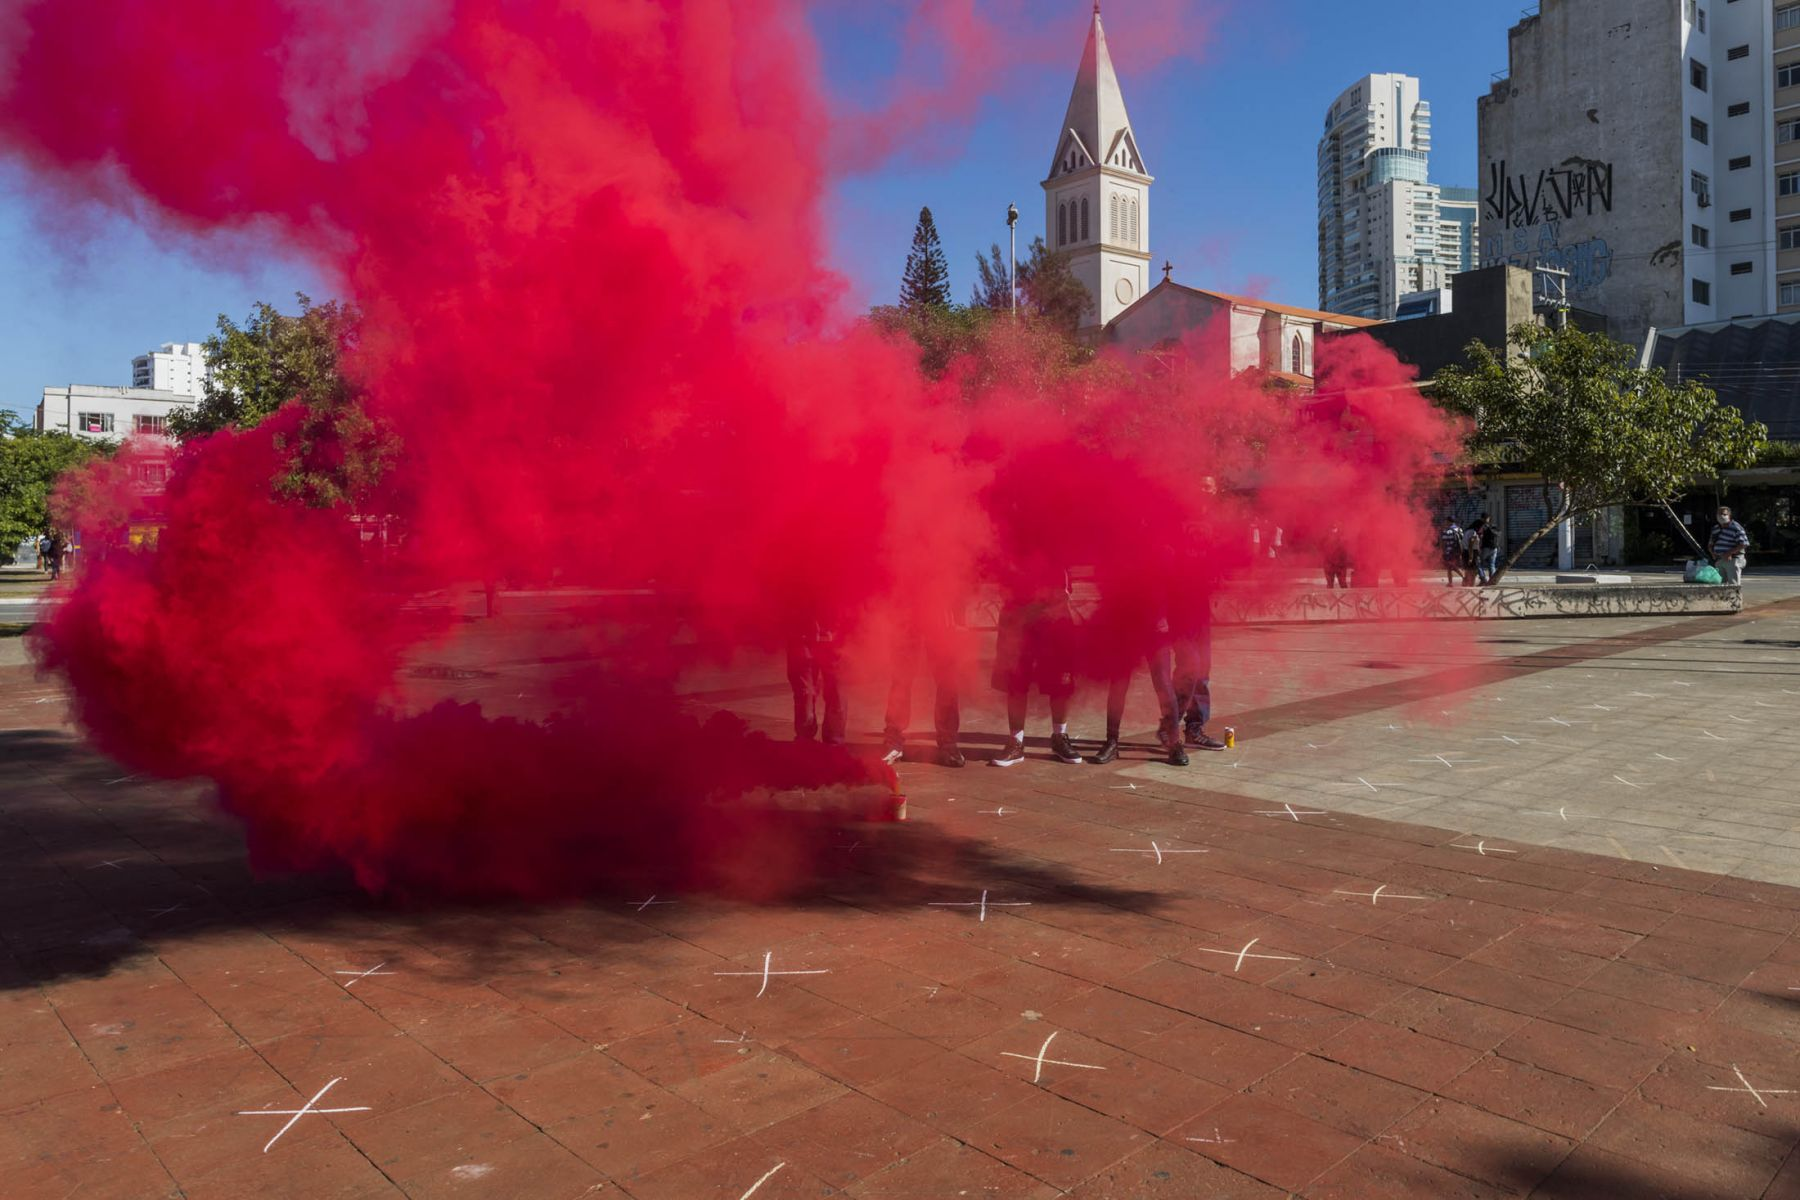 II-Ato-das-Torcidas-Antifascistas-no-Largo-da-Batata.-Foto_-Fumaca-Antifascista_divulgacao-1